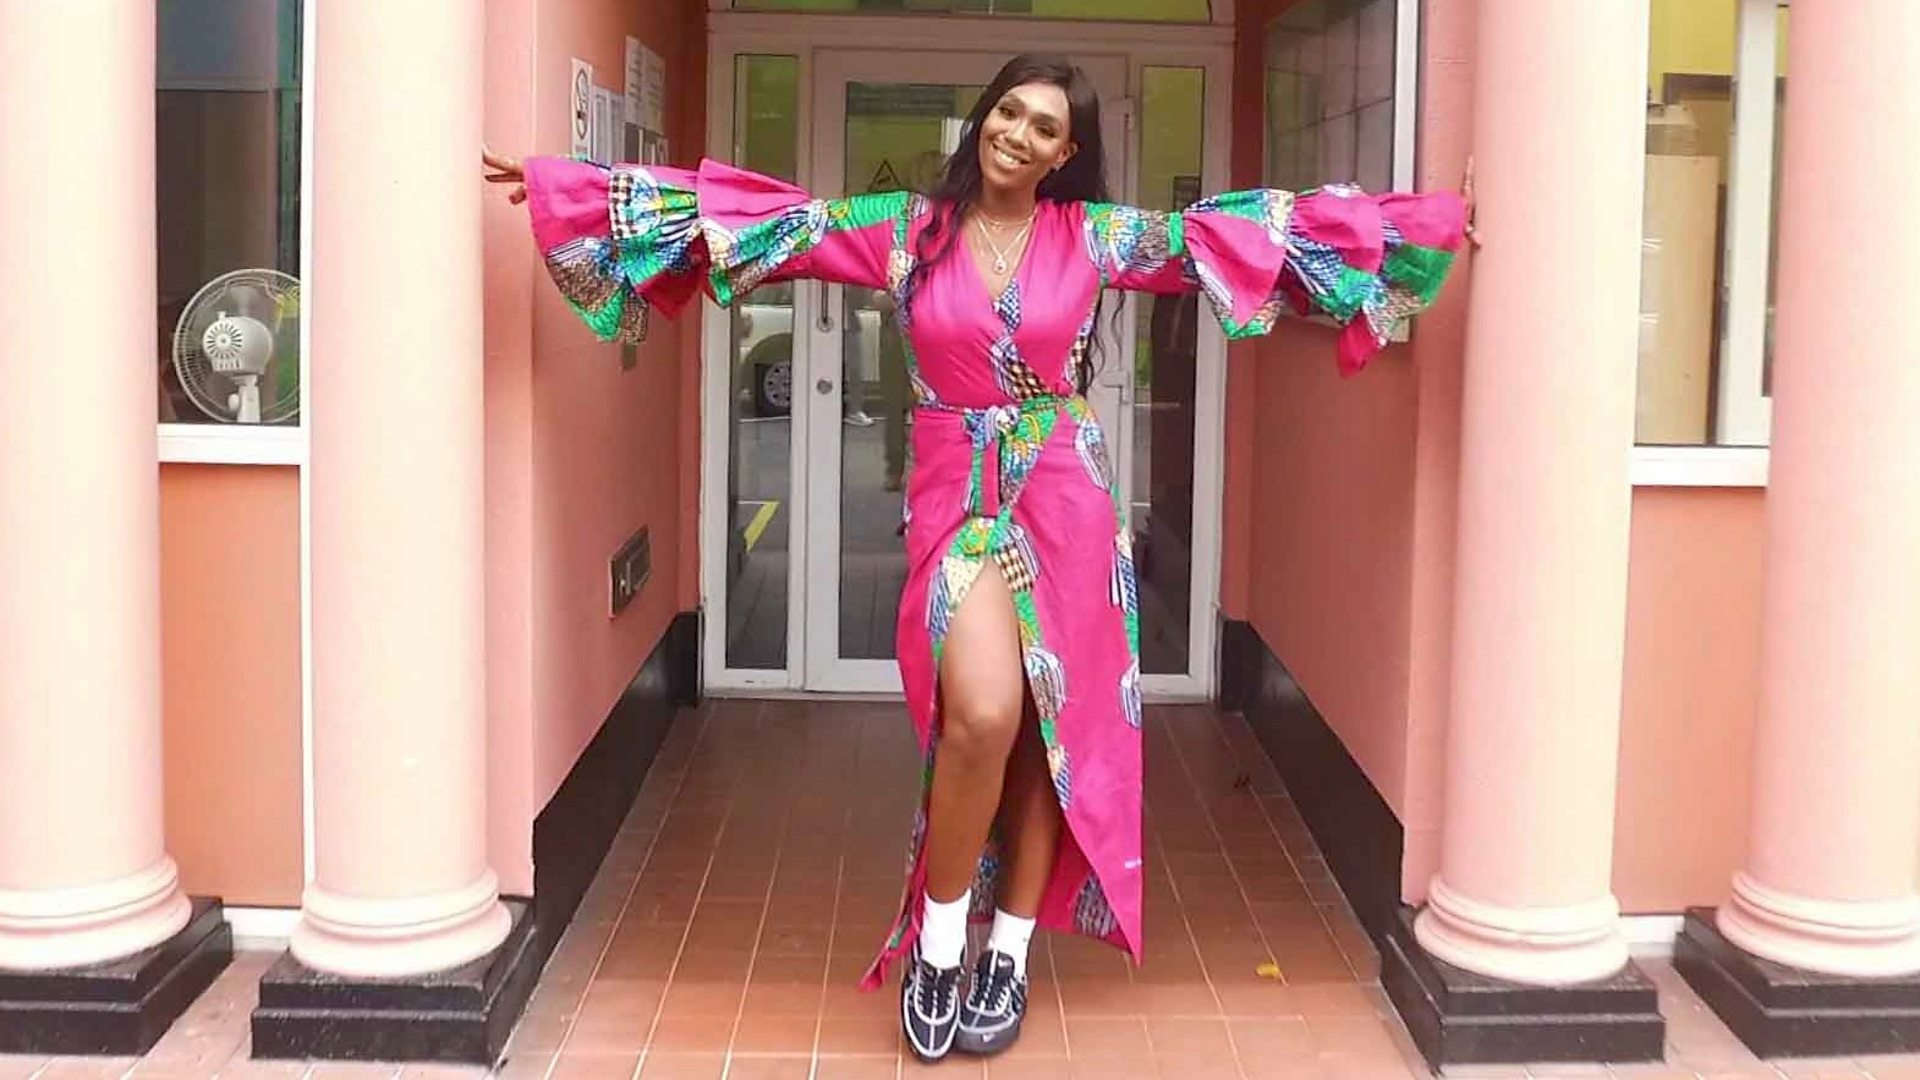 Lagos Fashion Week Designer Irene Agbontaen S Clothes For Tall Women Bbc News